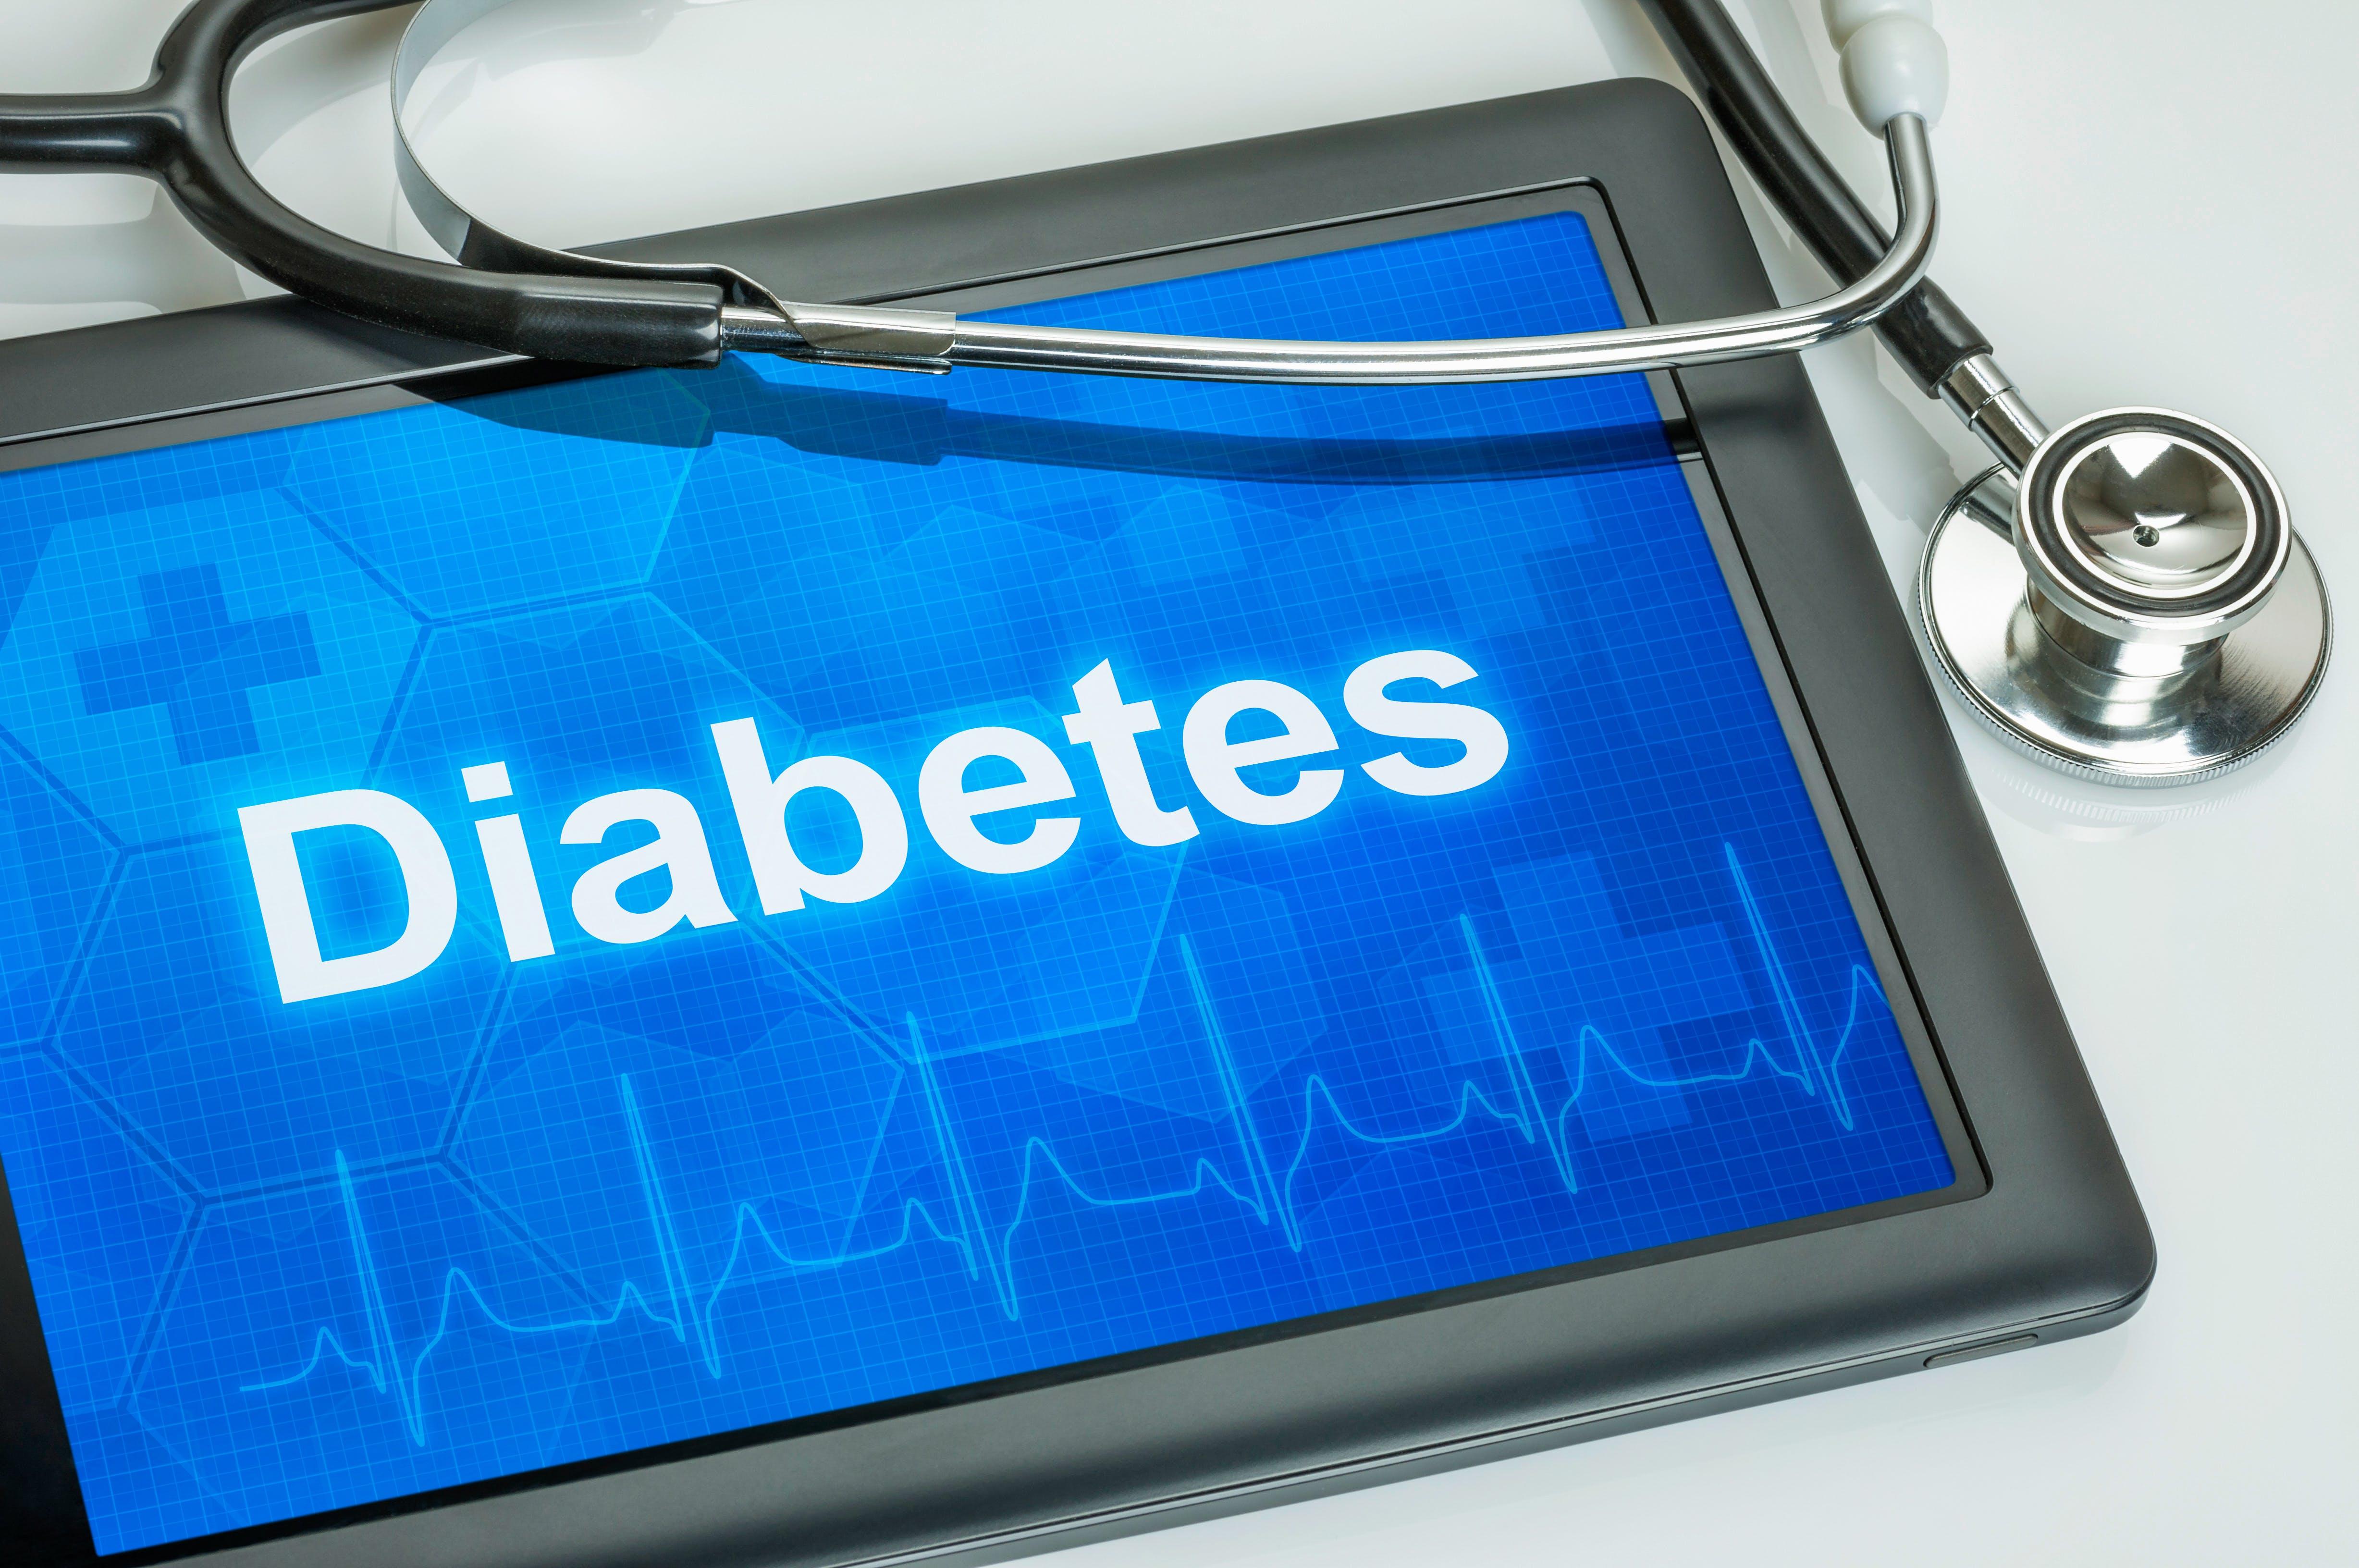 Ny studie: Fem typer av diabetes